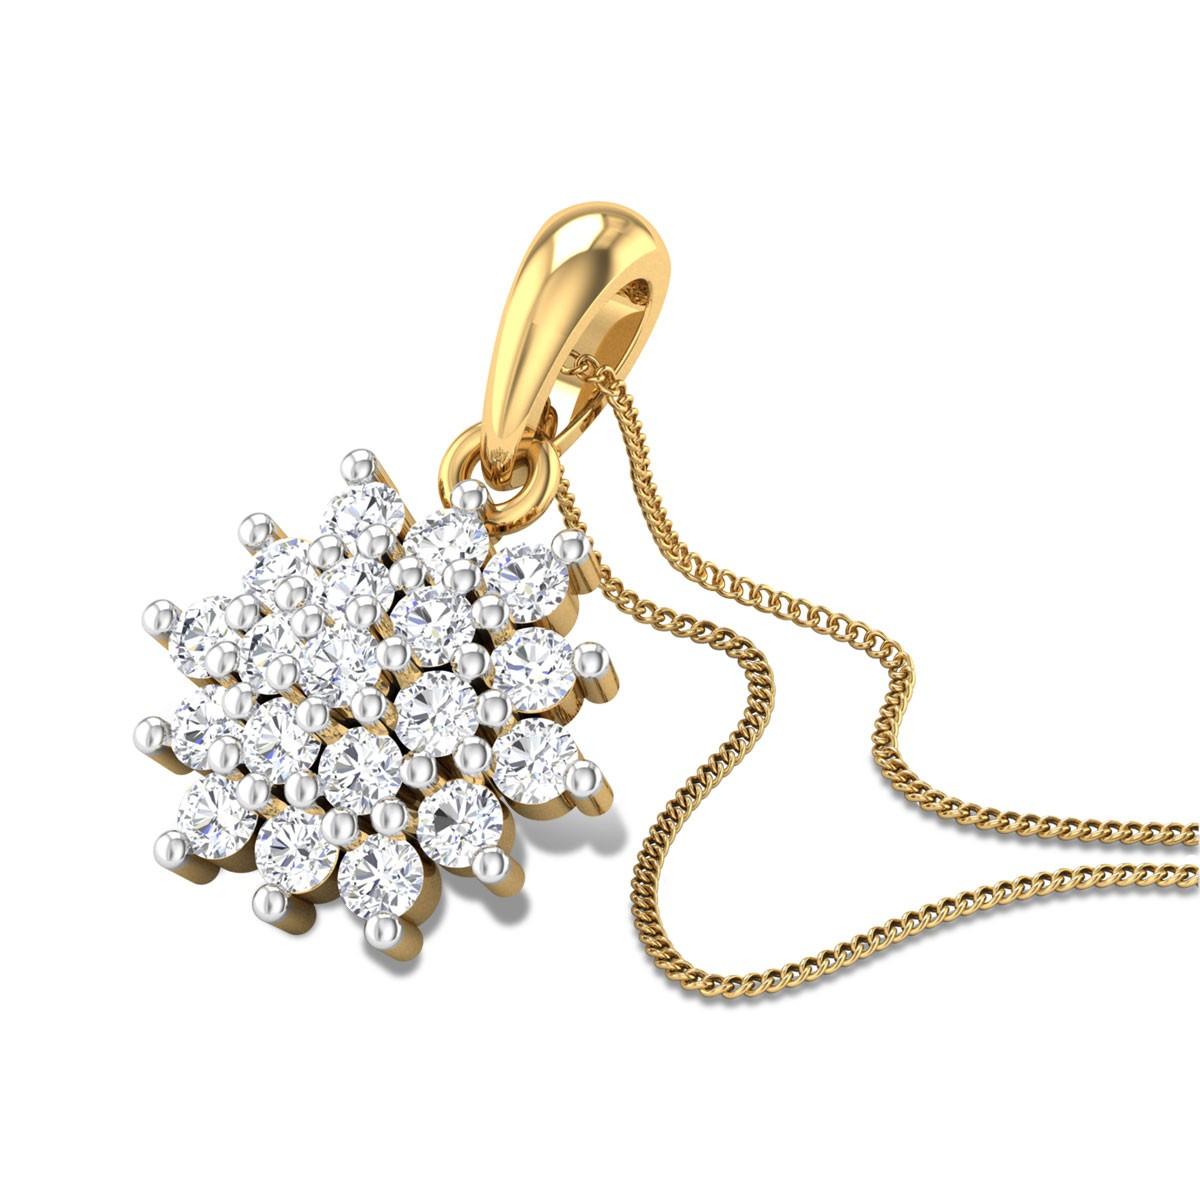 Snowdrop Diamond Pendant